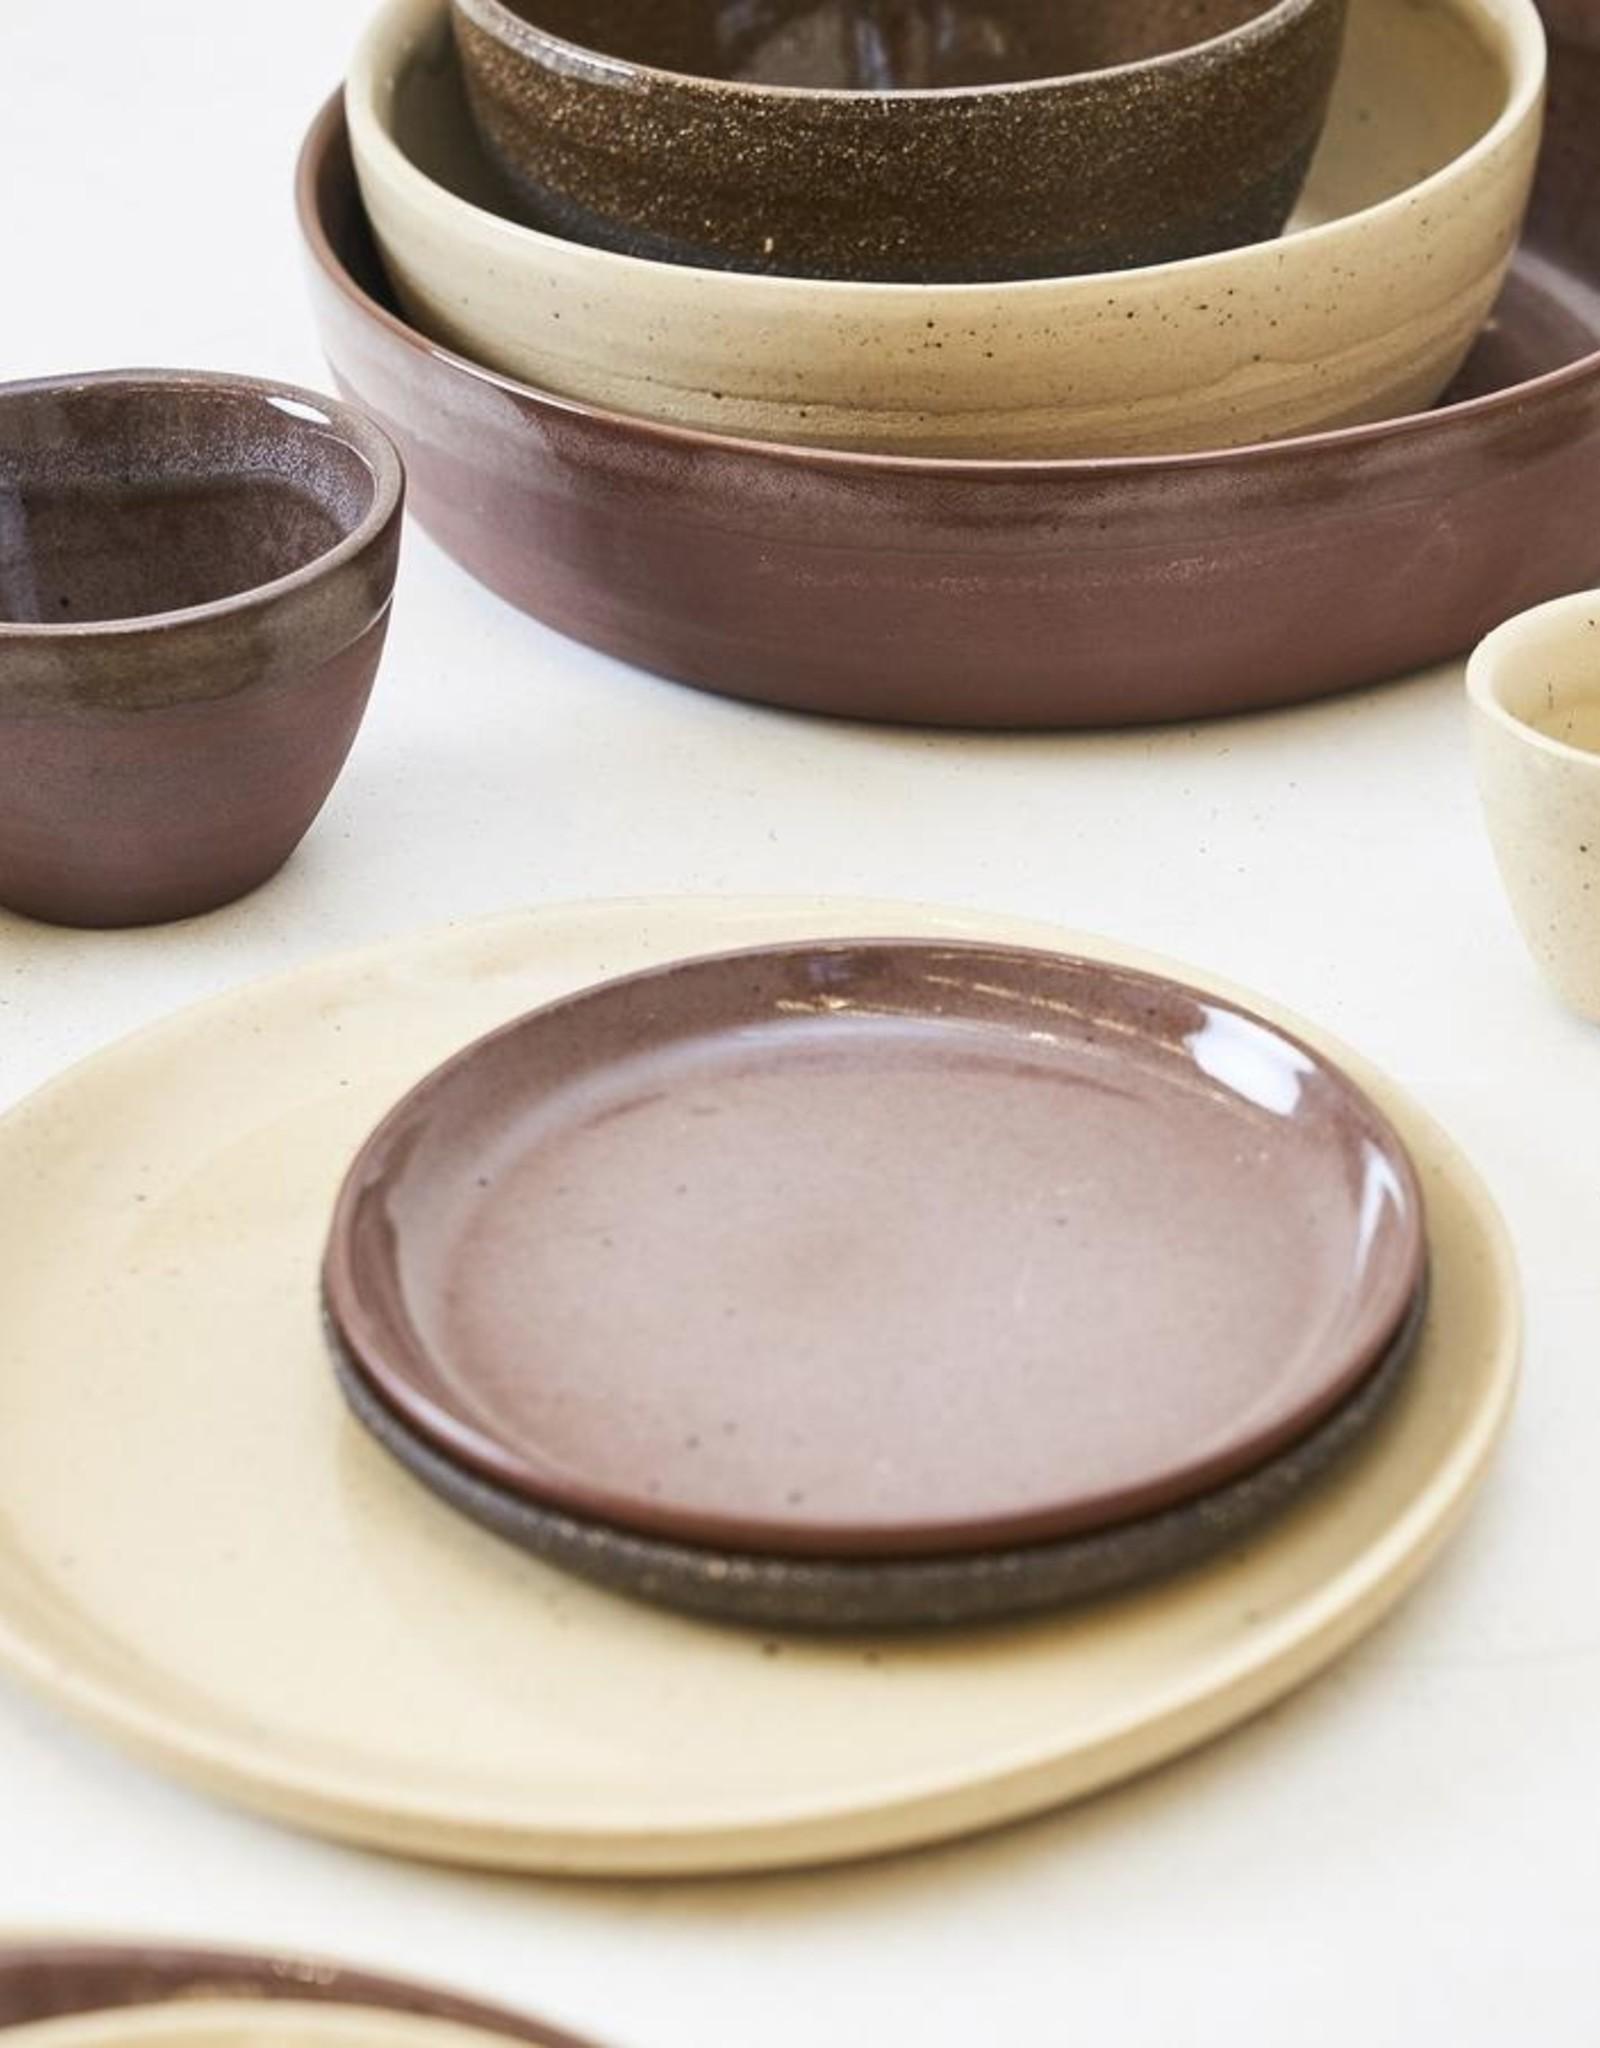 Yann plate S - Creme